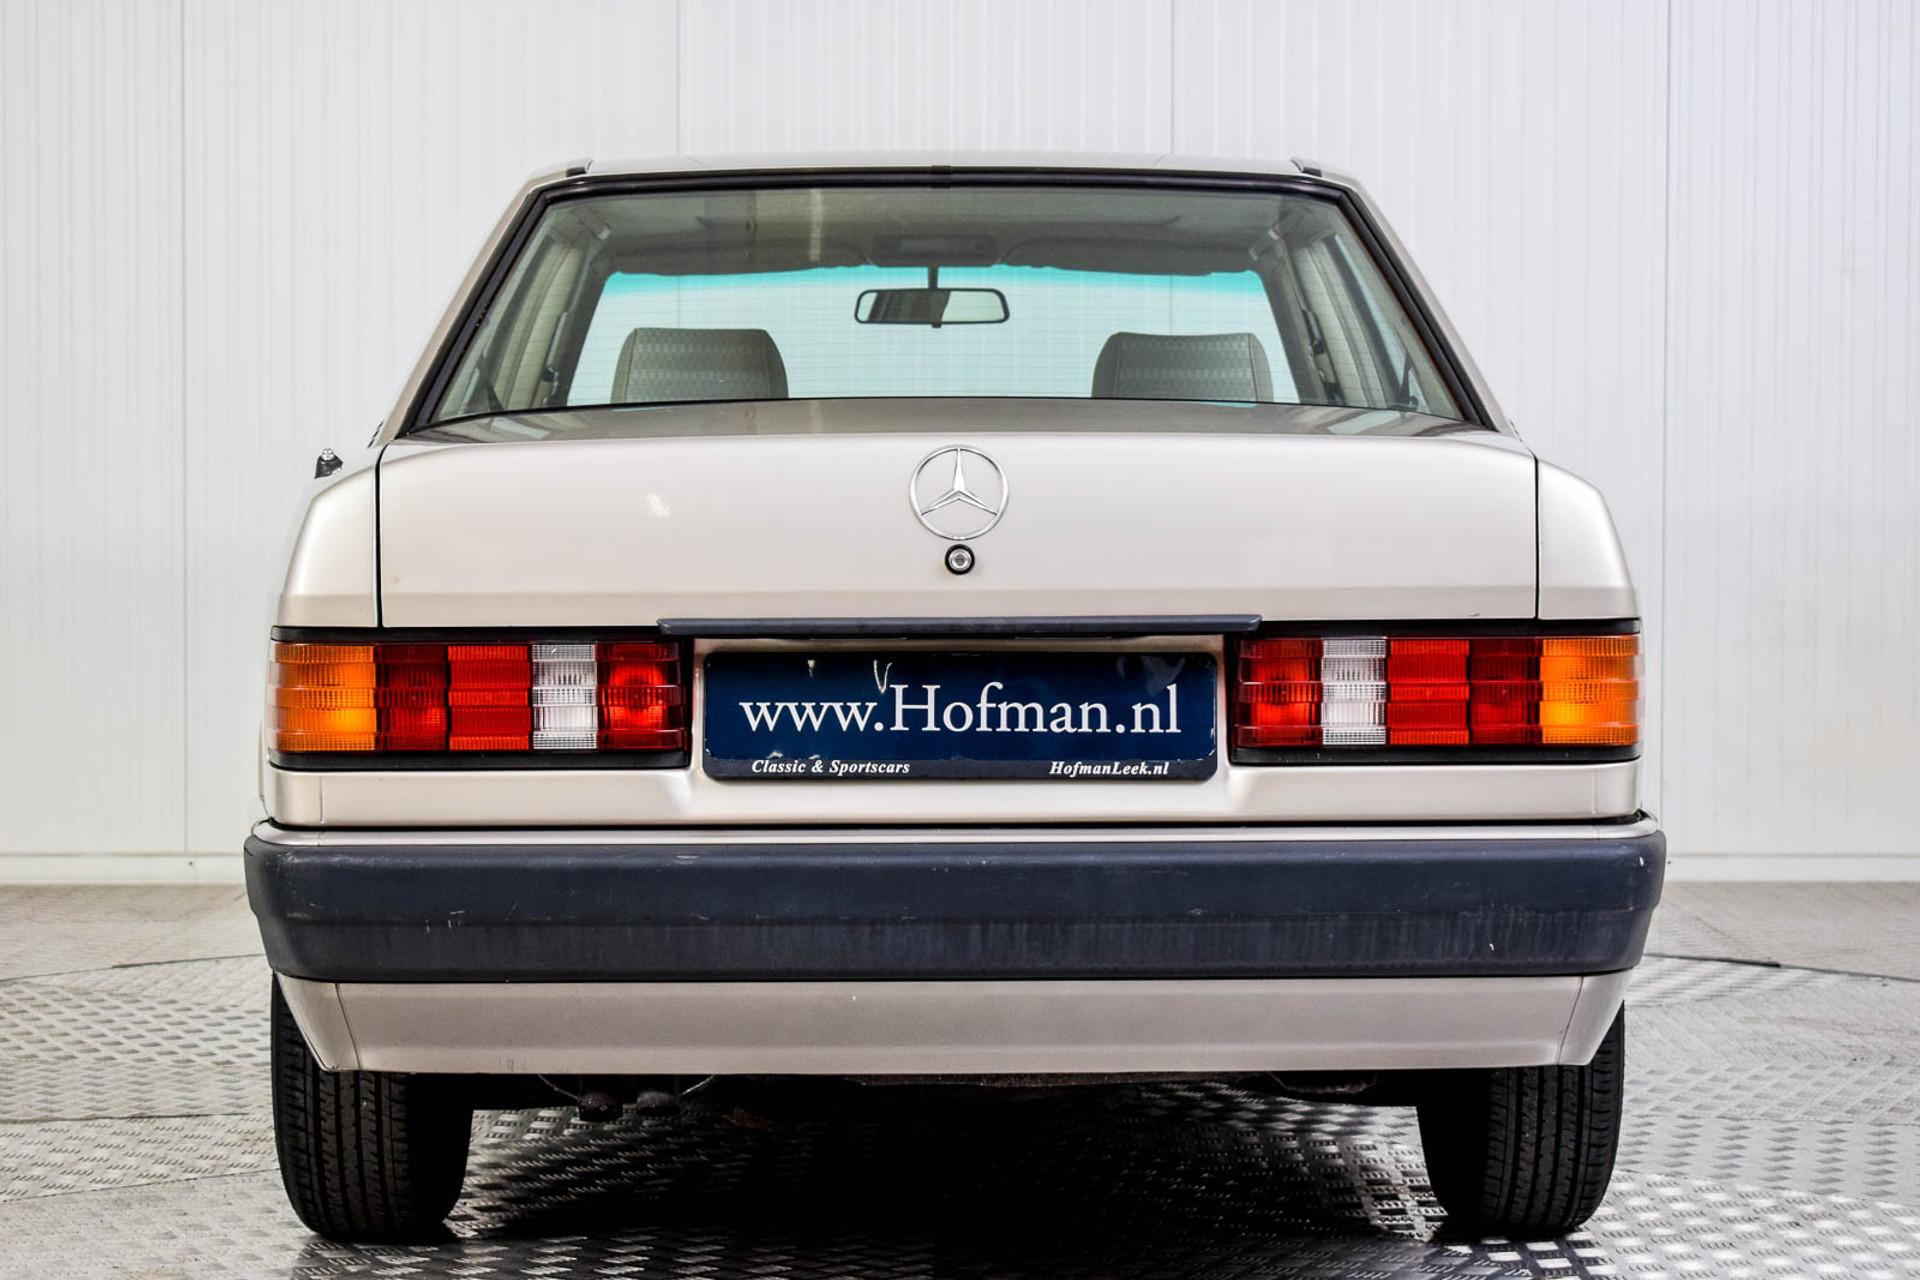 Mercedes-Benz 190 2.5 D Turbo Diesel Foto 4